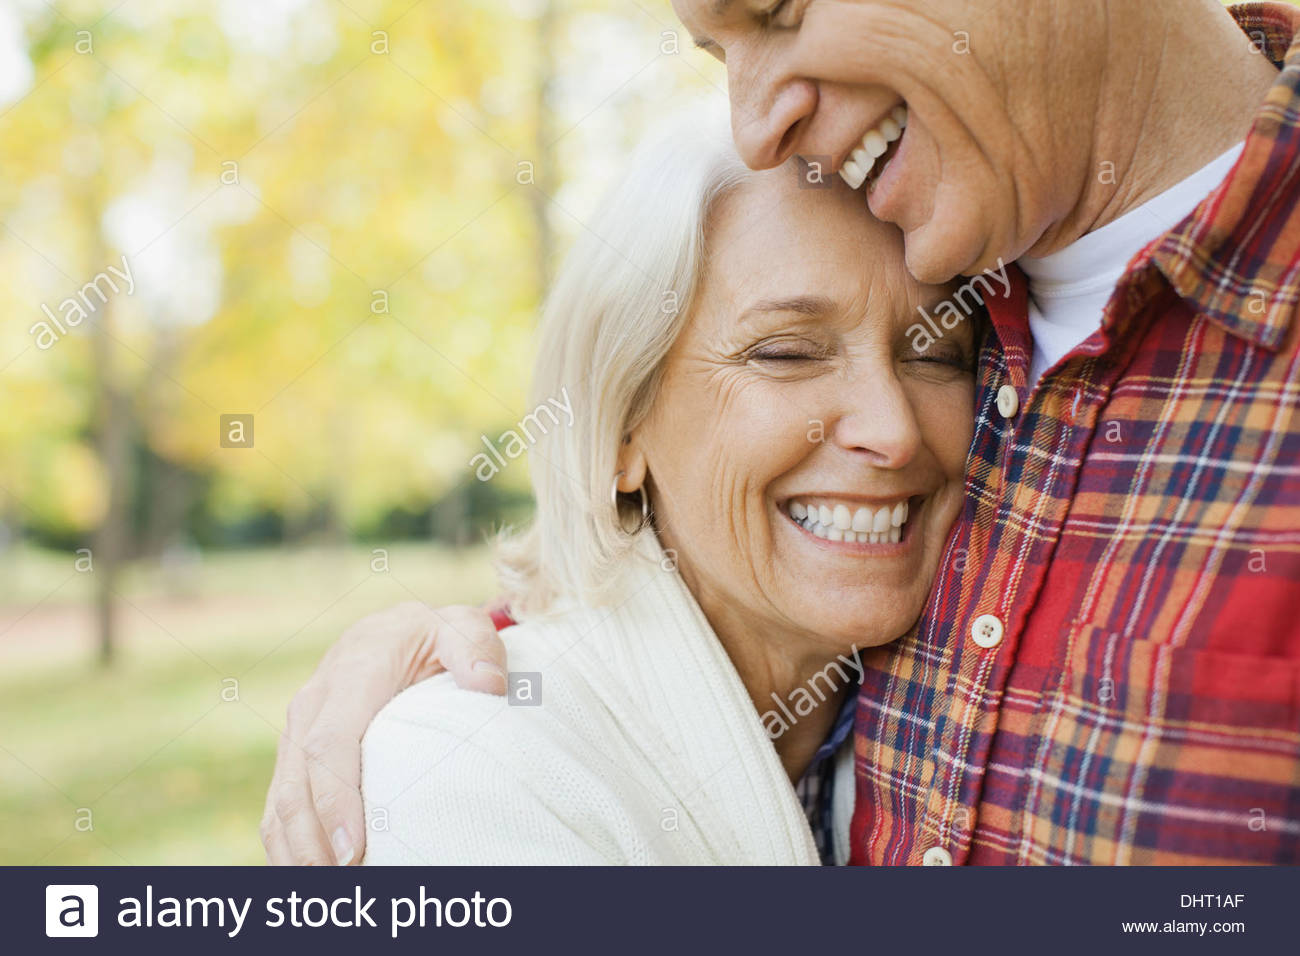 Loving mature man embracing woman at park - Stock Image